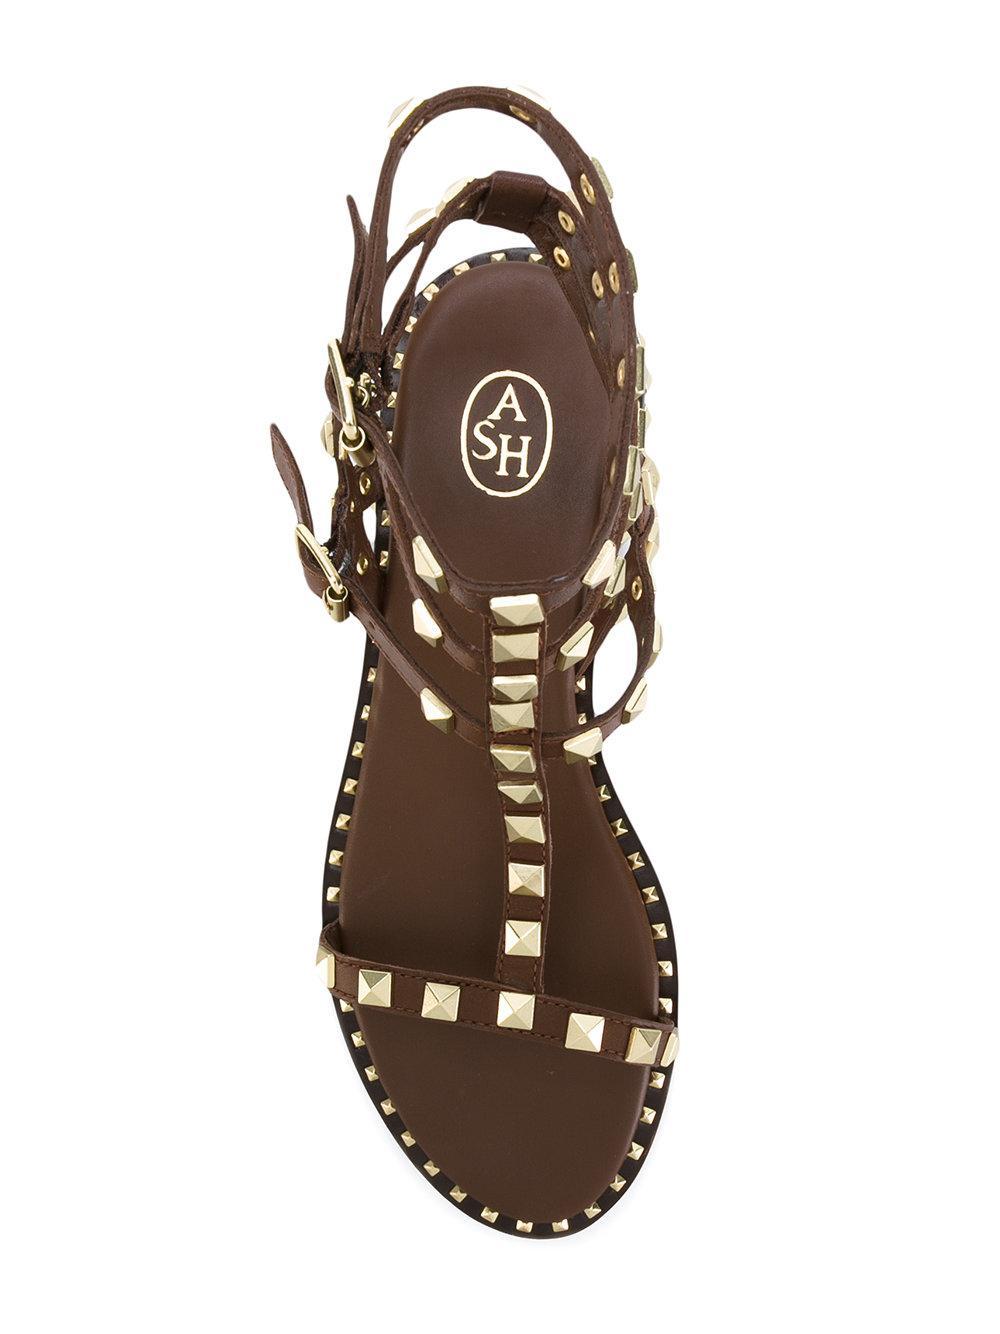 Lyst Ash Poison Sandals In Brown